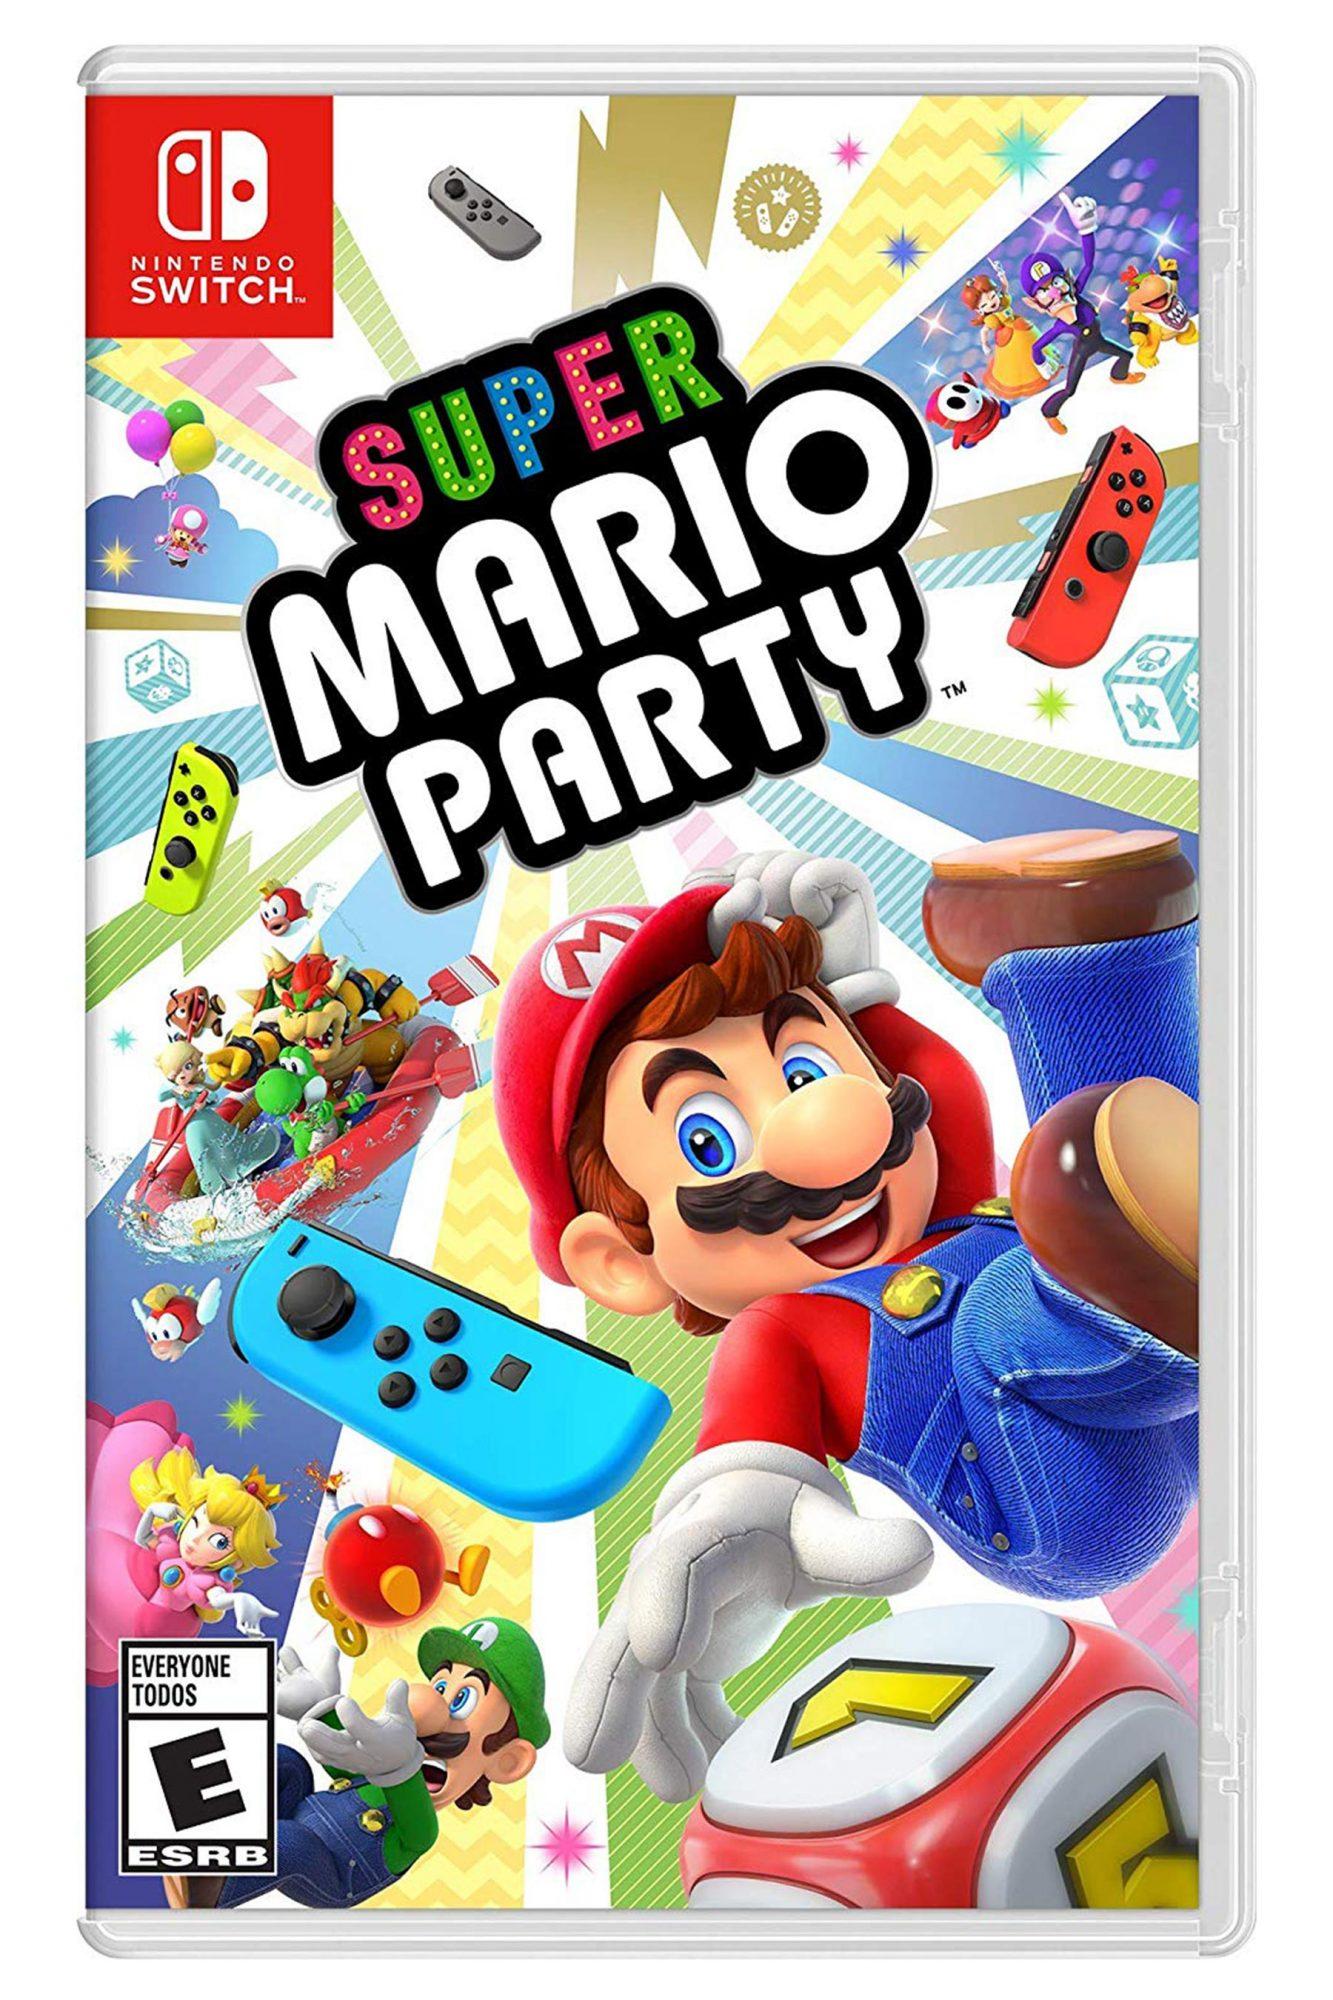 Nintendo S Mario Day Sale Deals On Nintendo Switch Games Ew Com